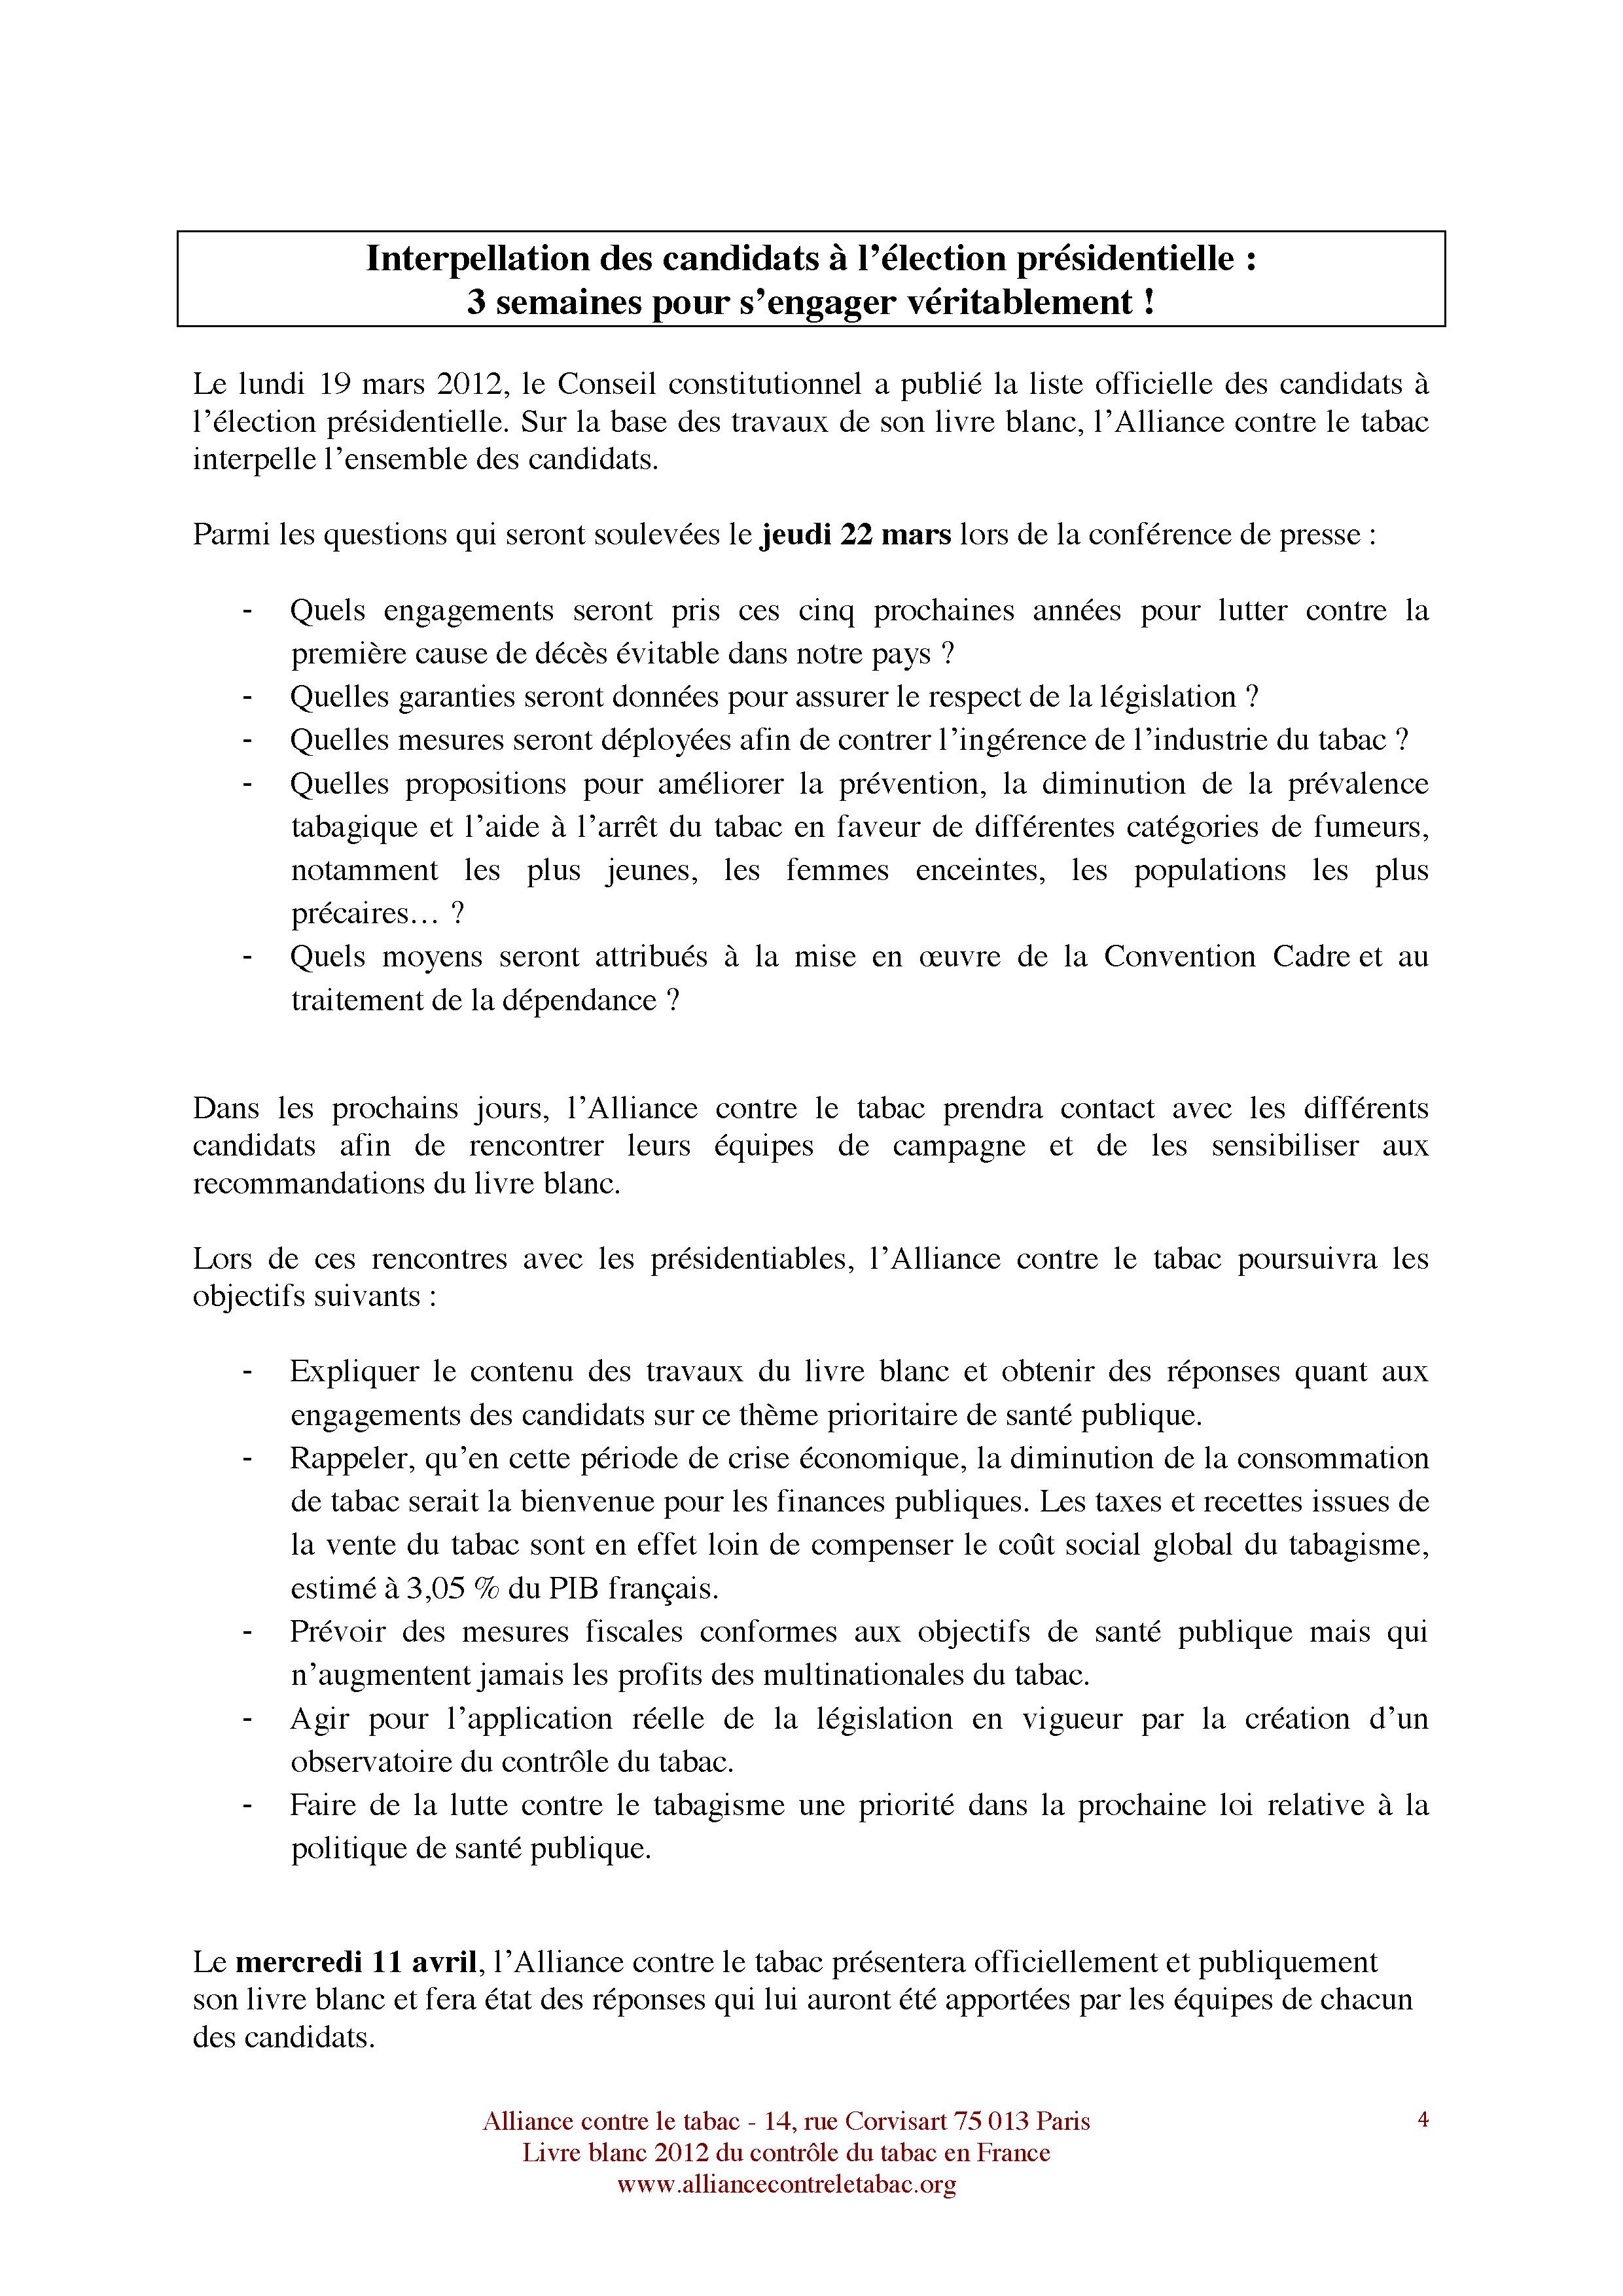 Alliance-dossier-presse_livre-blanc-22mars2012_Page_04.jpg